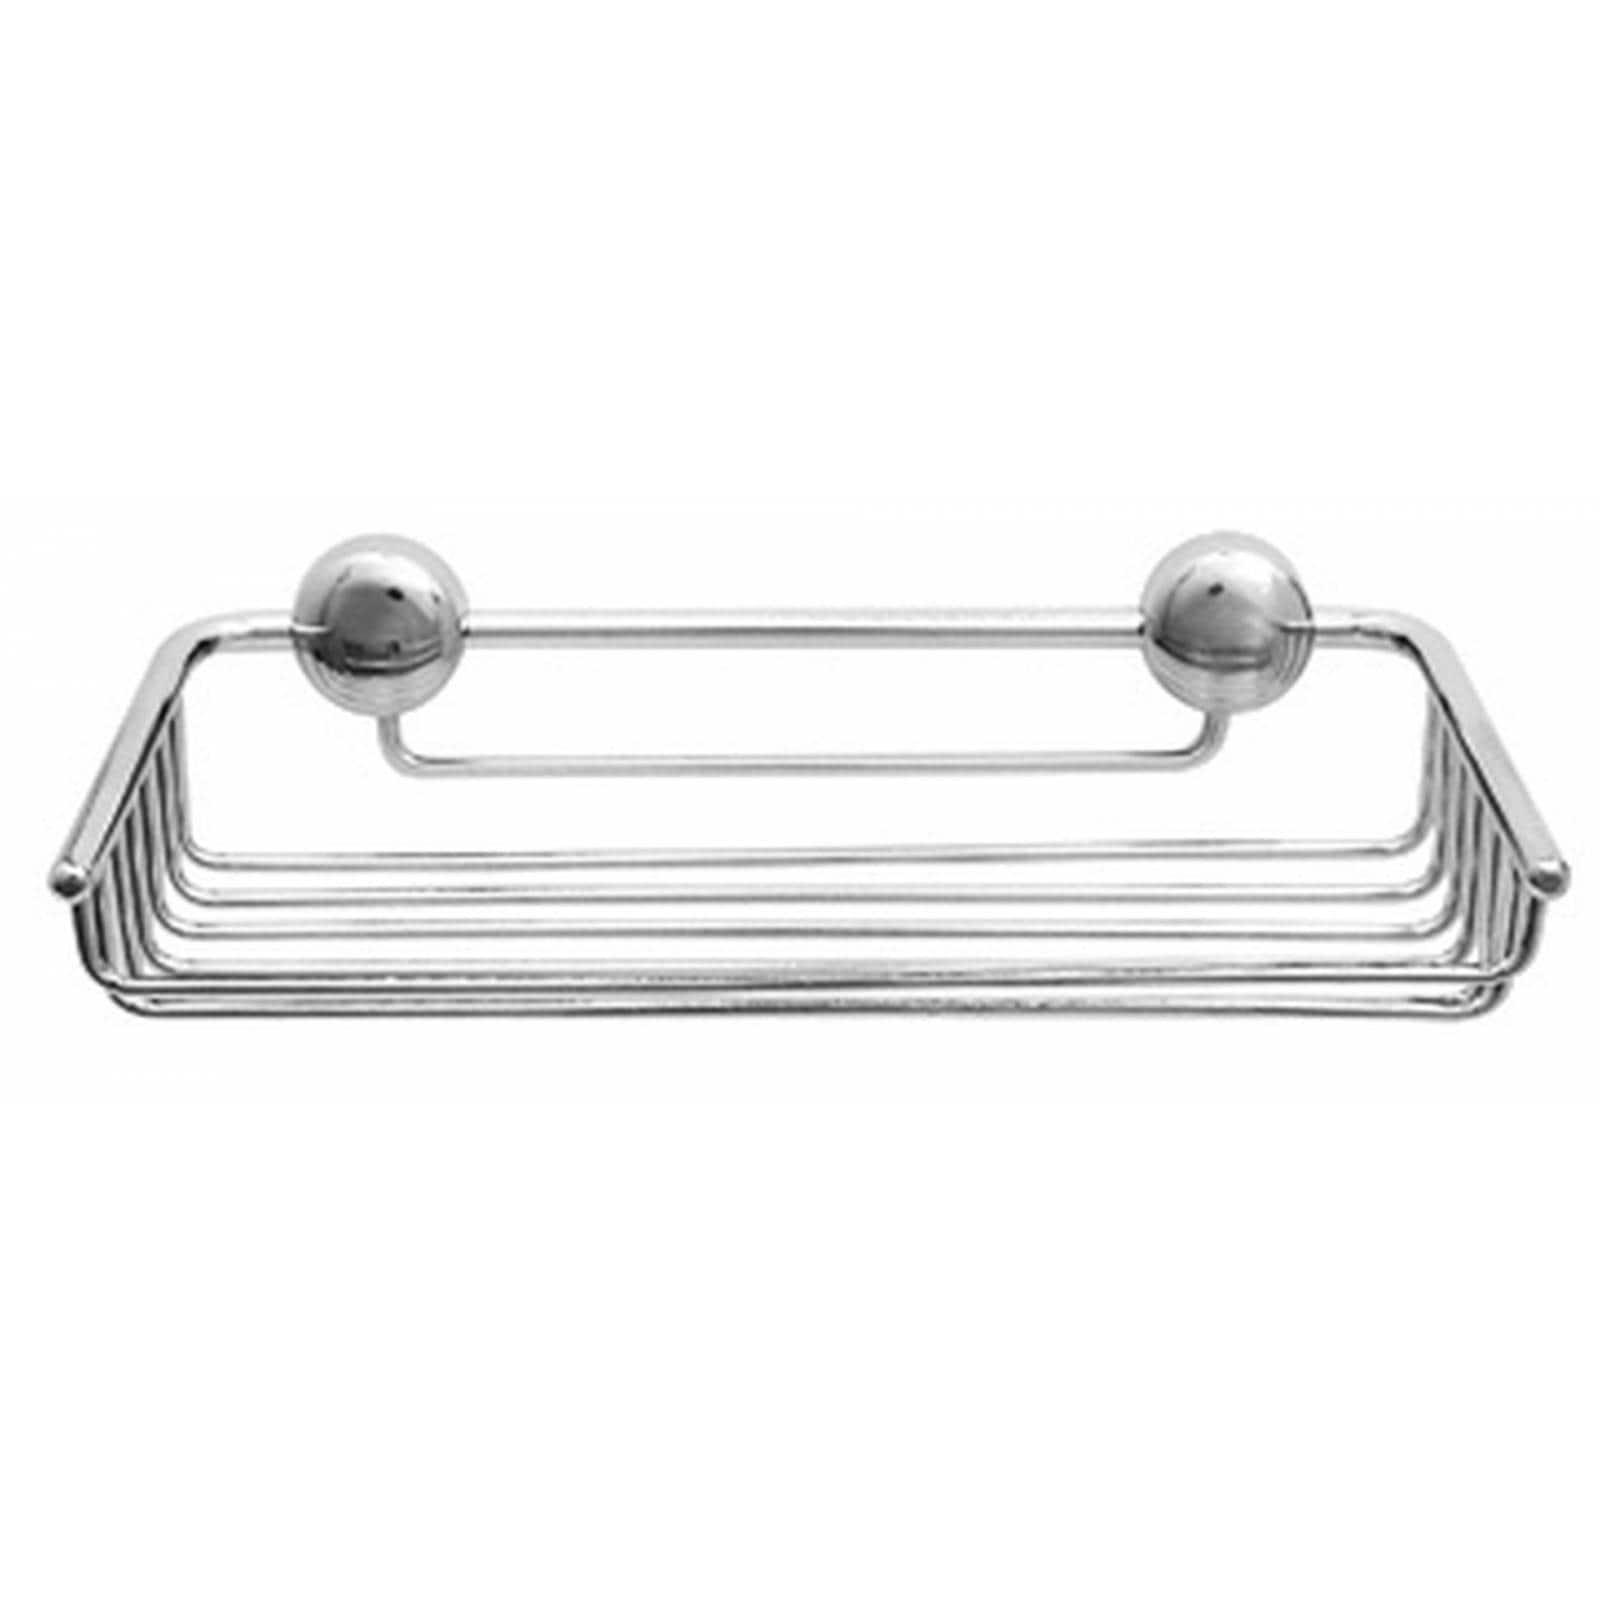 Repisa portajabón rectangular para regadera INOX 9610 URREA